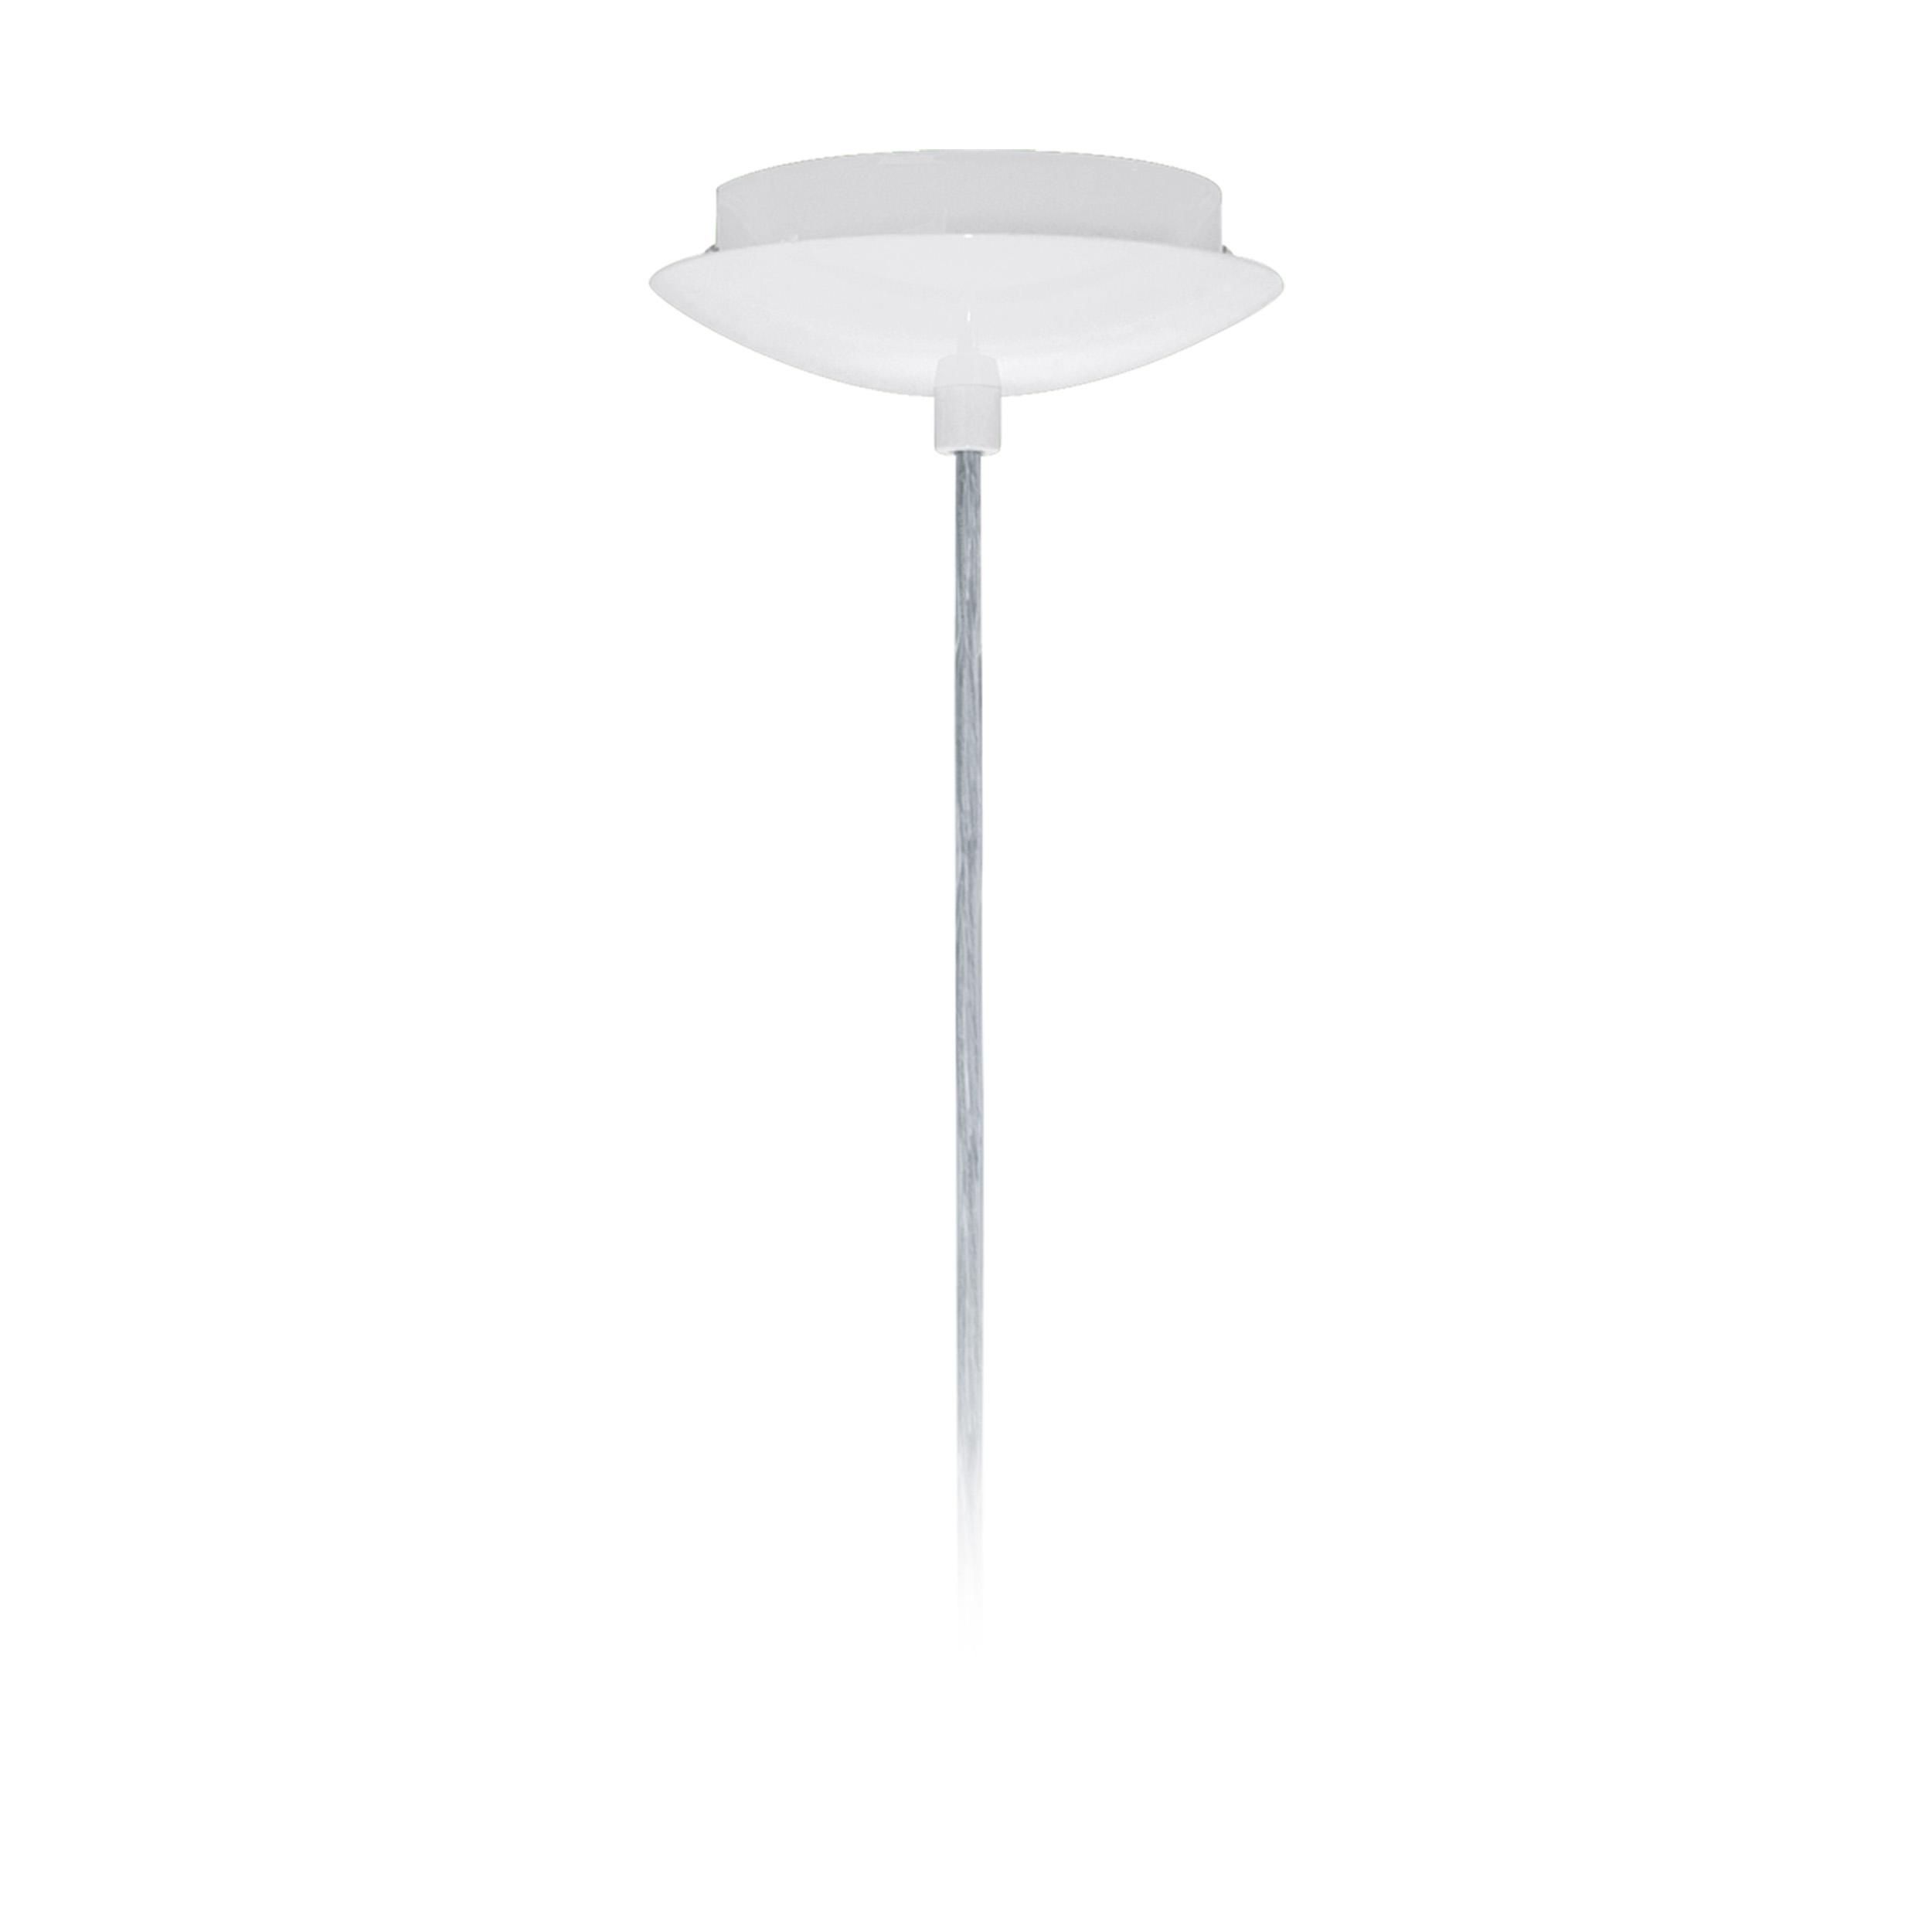 1 Stk Baldachin Pascoa 1 flammig weiß glänzend IP20 LI62314---